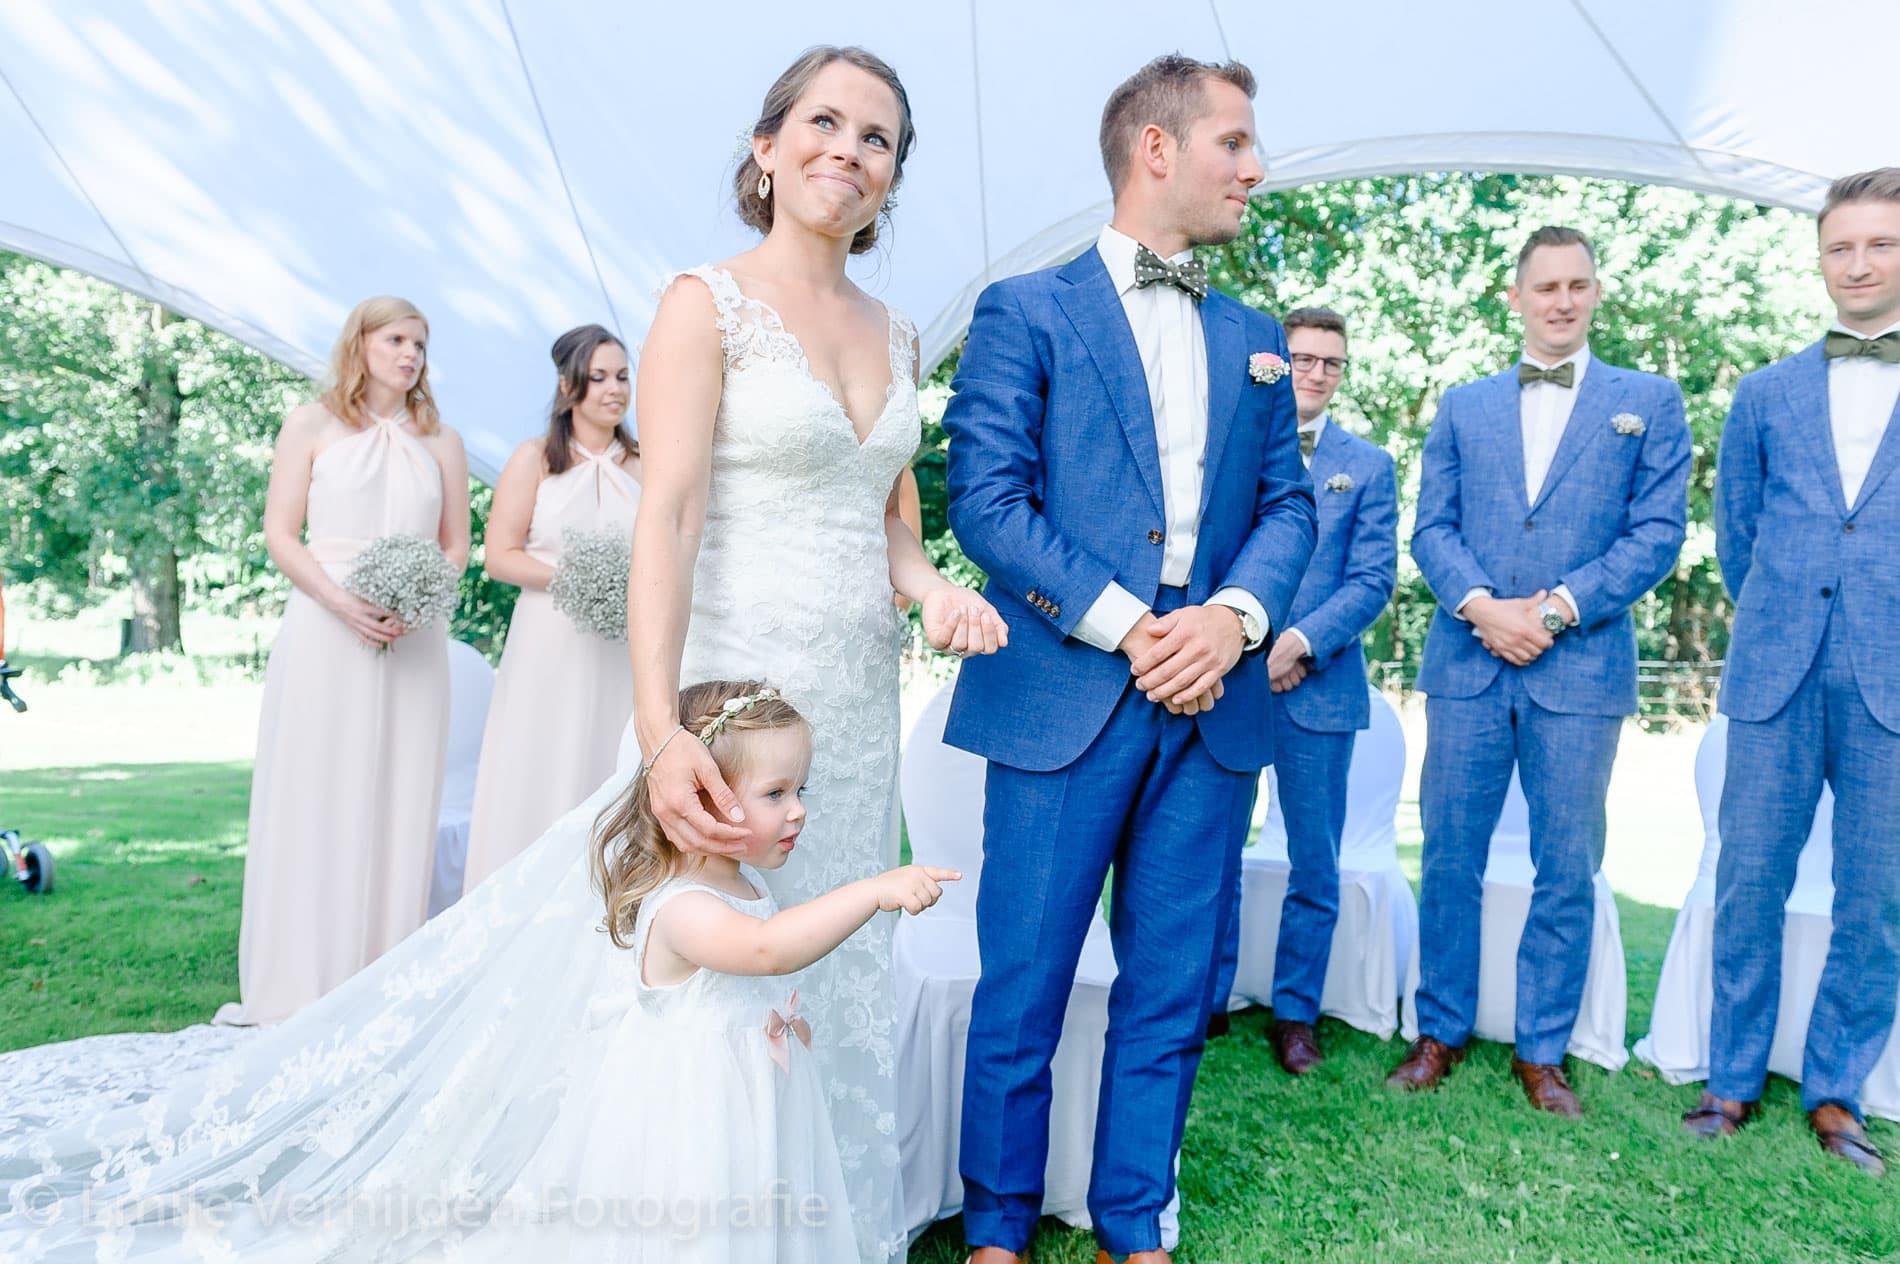 Yes het gaat gebeuren- Bruidsfotografie Winselerhof Landgraaf - Kerkrade